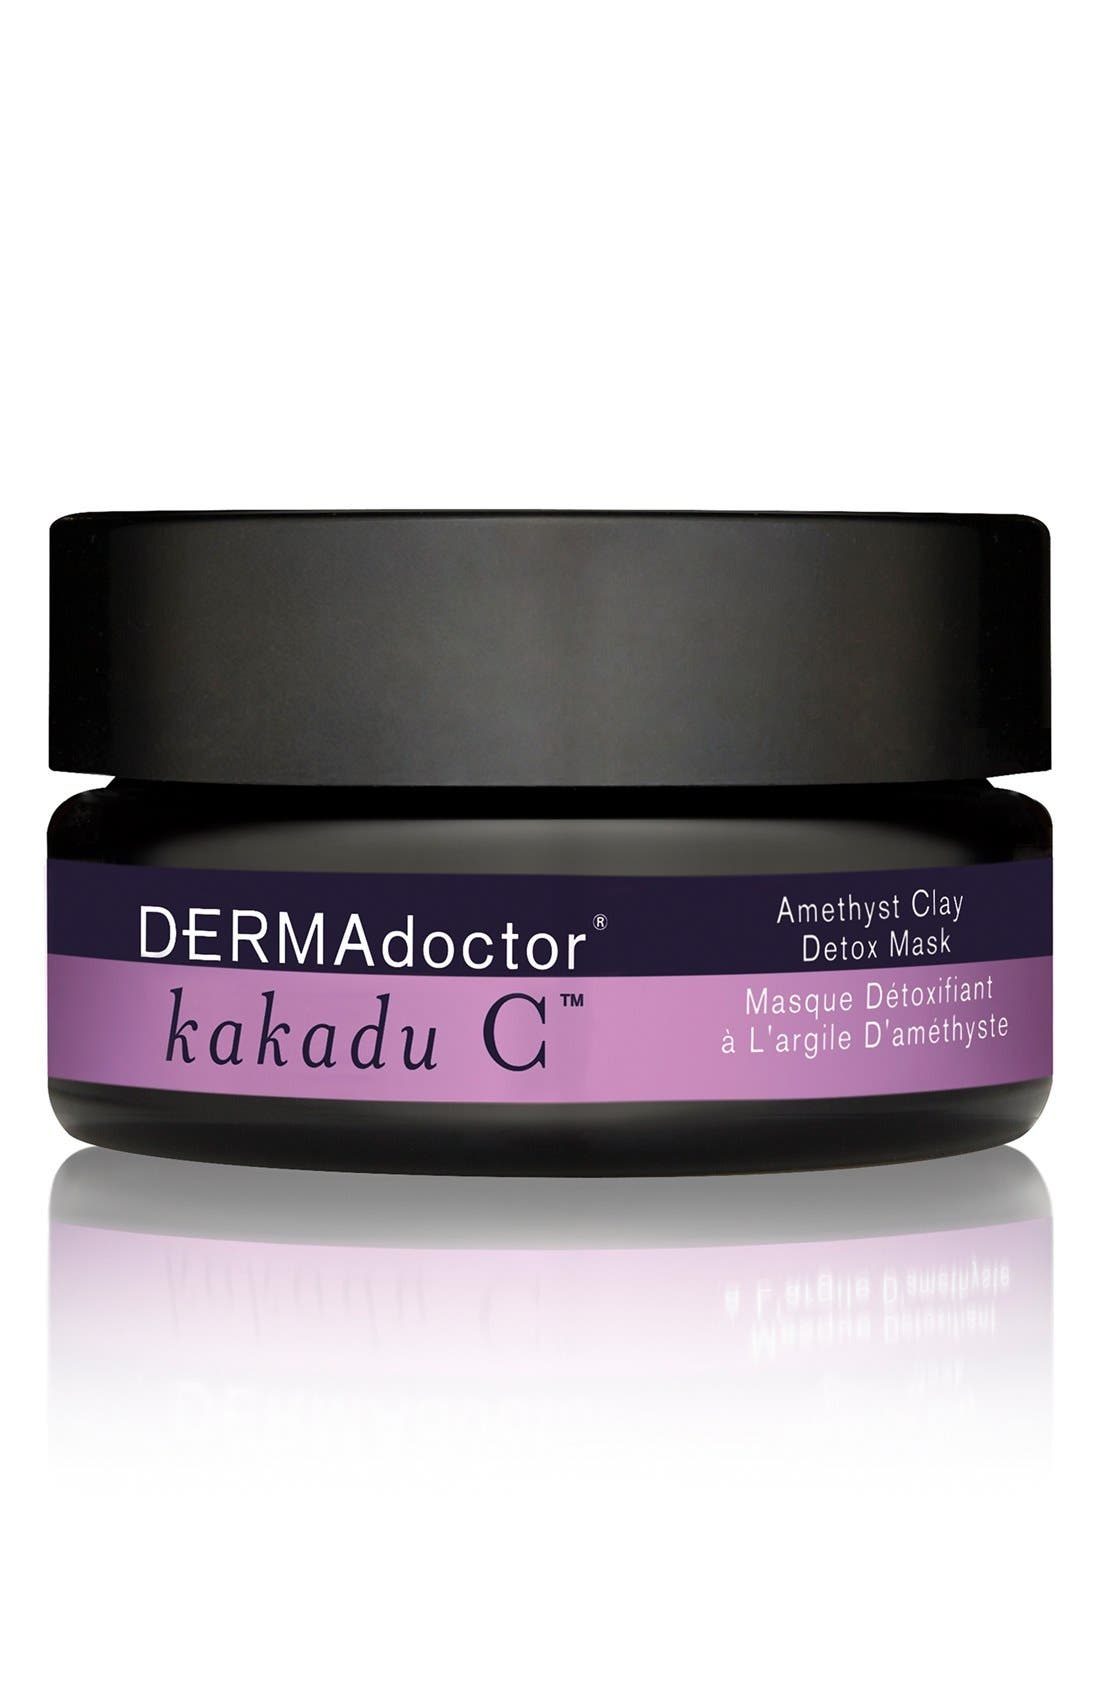 DERMAdoctor® 'kakadu C™' Amethyst Clay Detox Mask